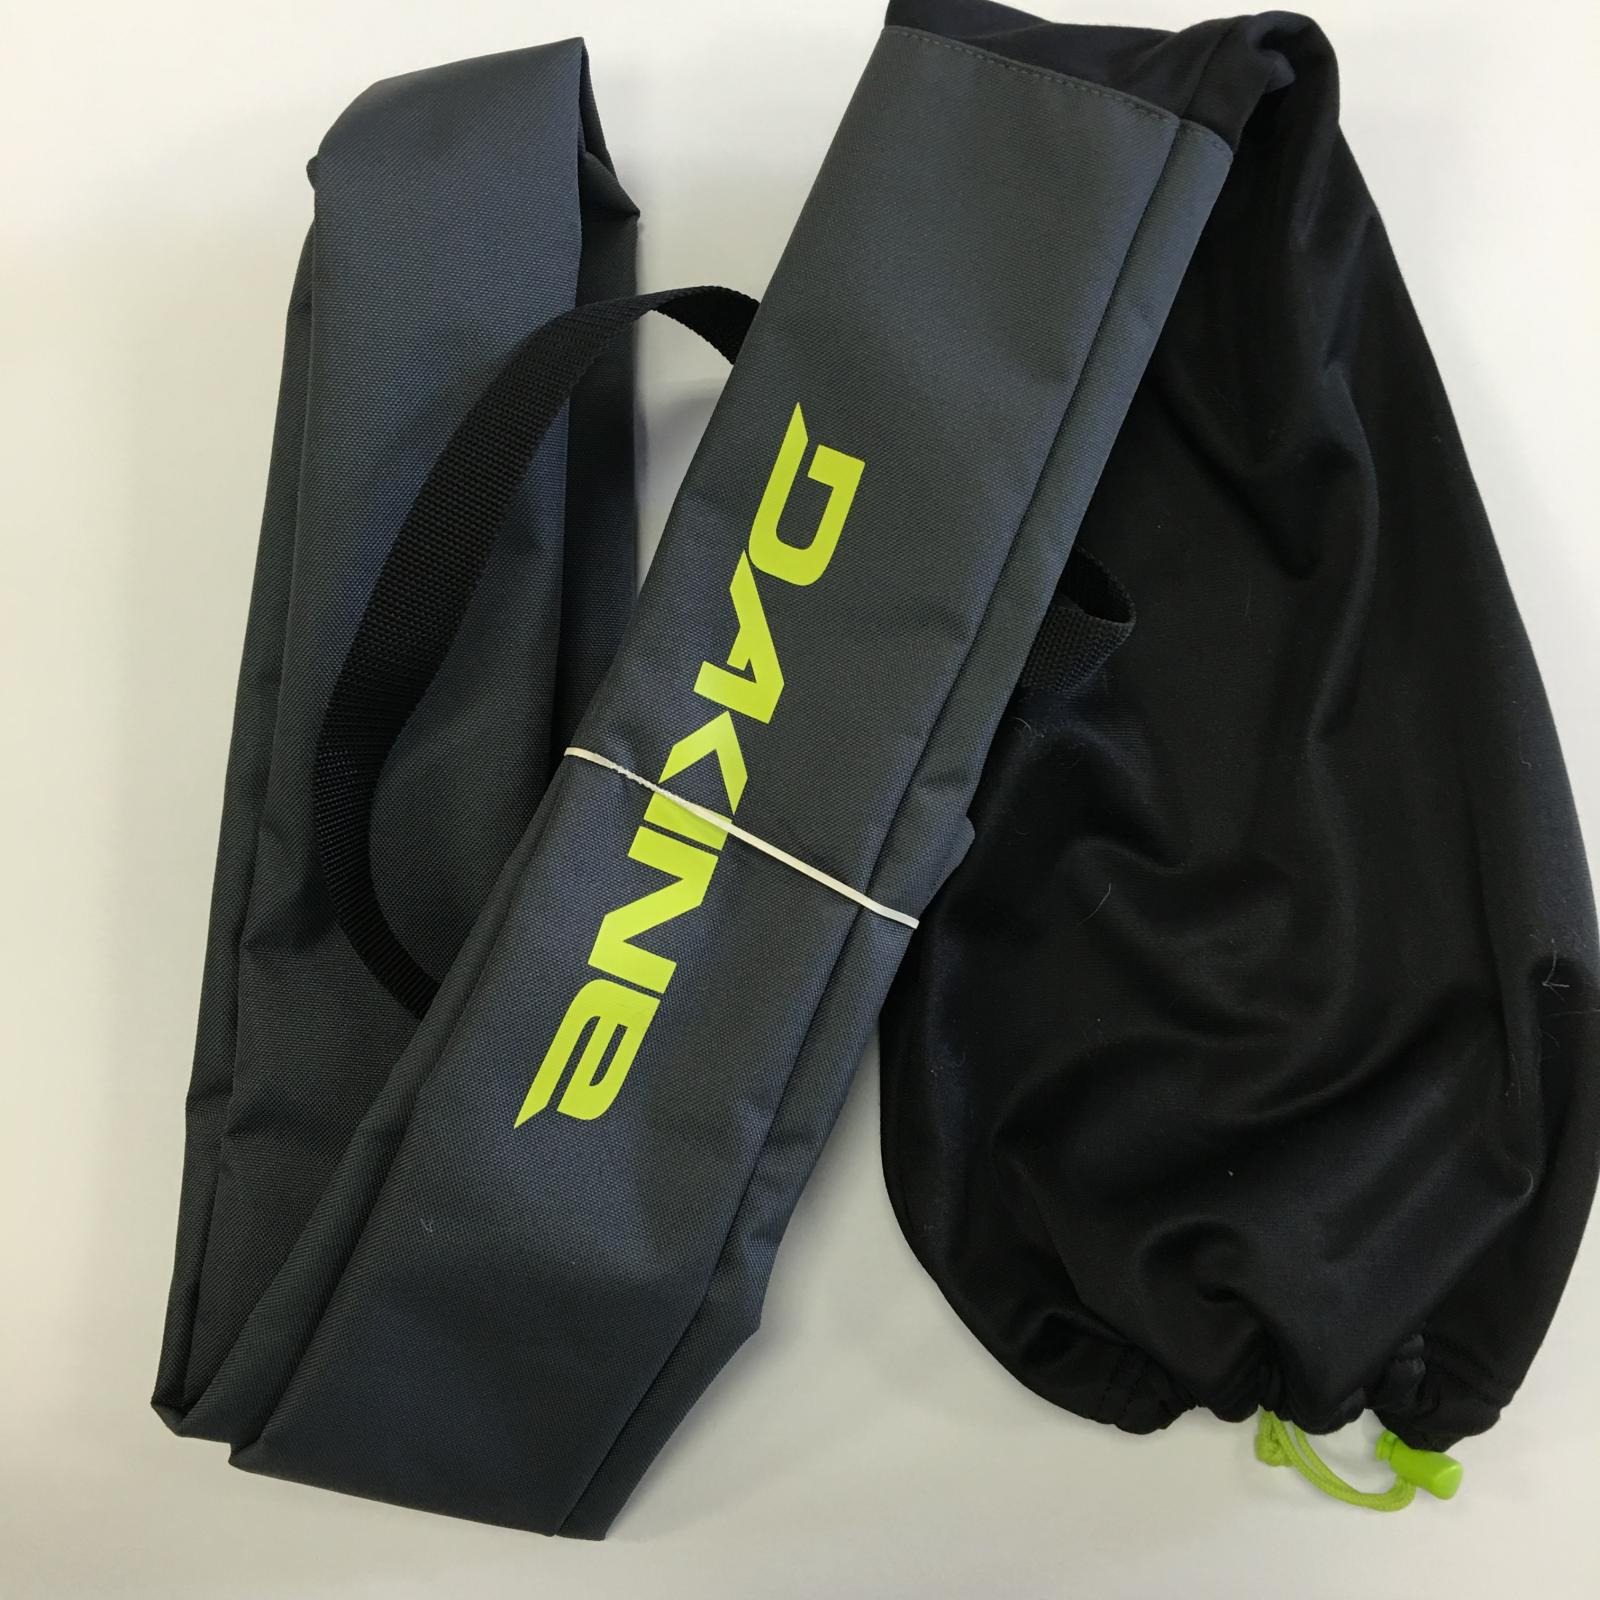 Dakine SUP Paddle Sock